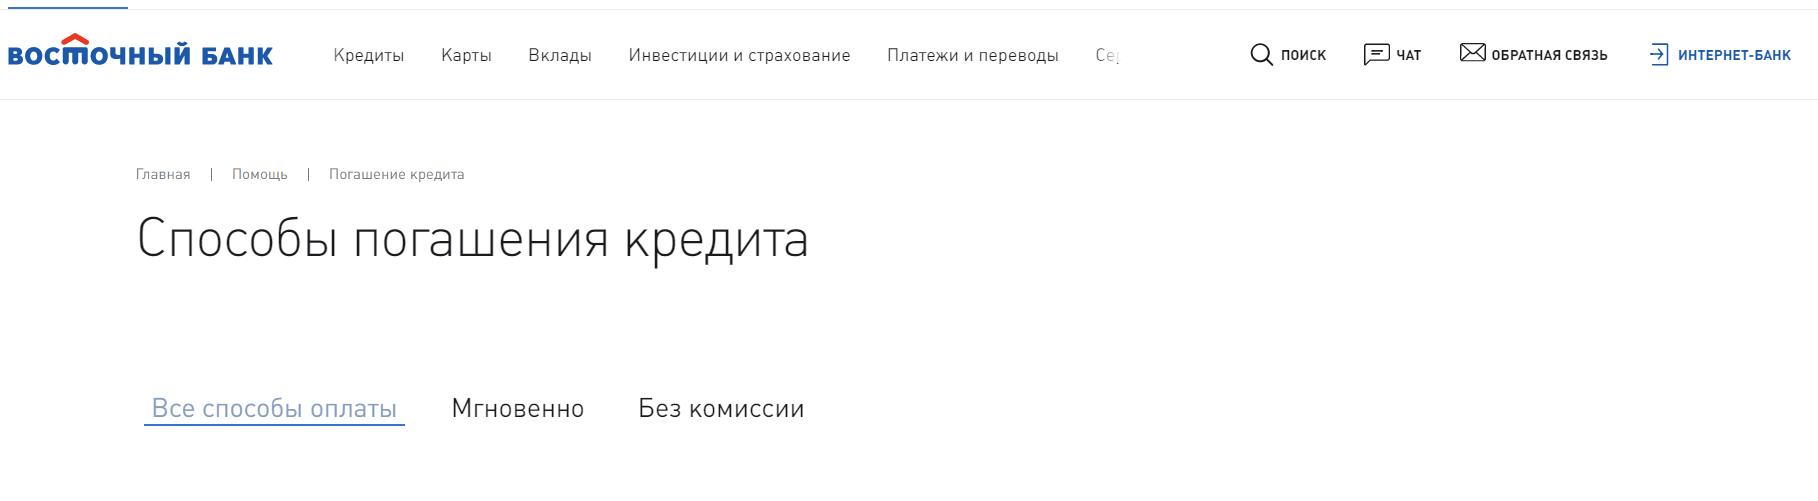 bank-vostochnyj-oplata-kredita-onlajn_